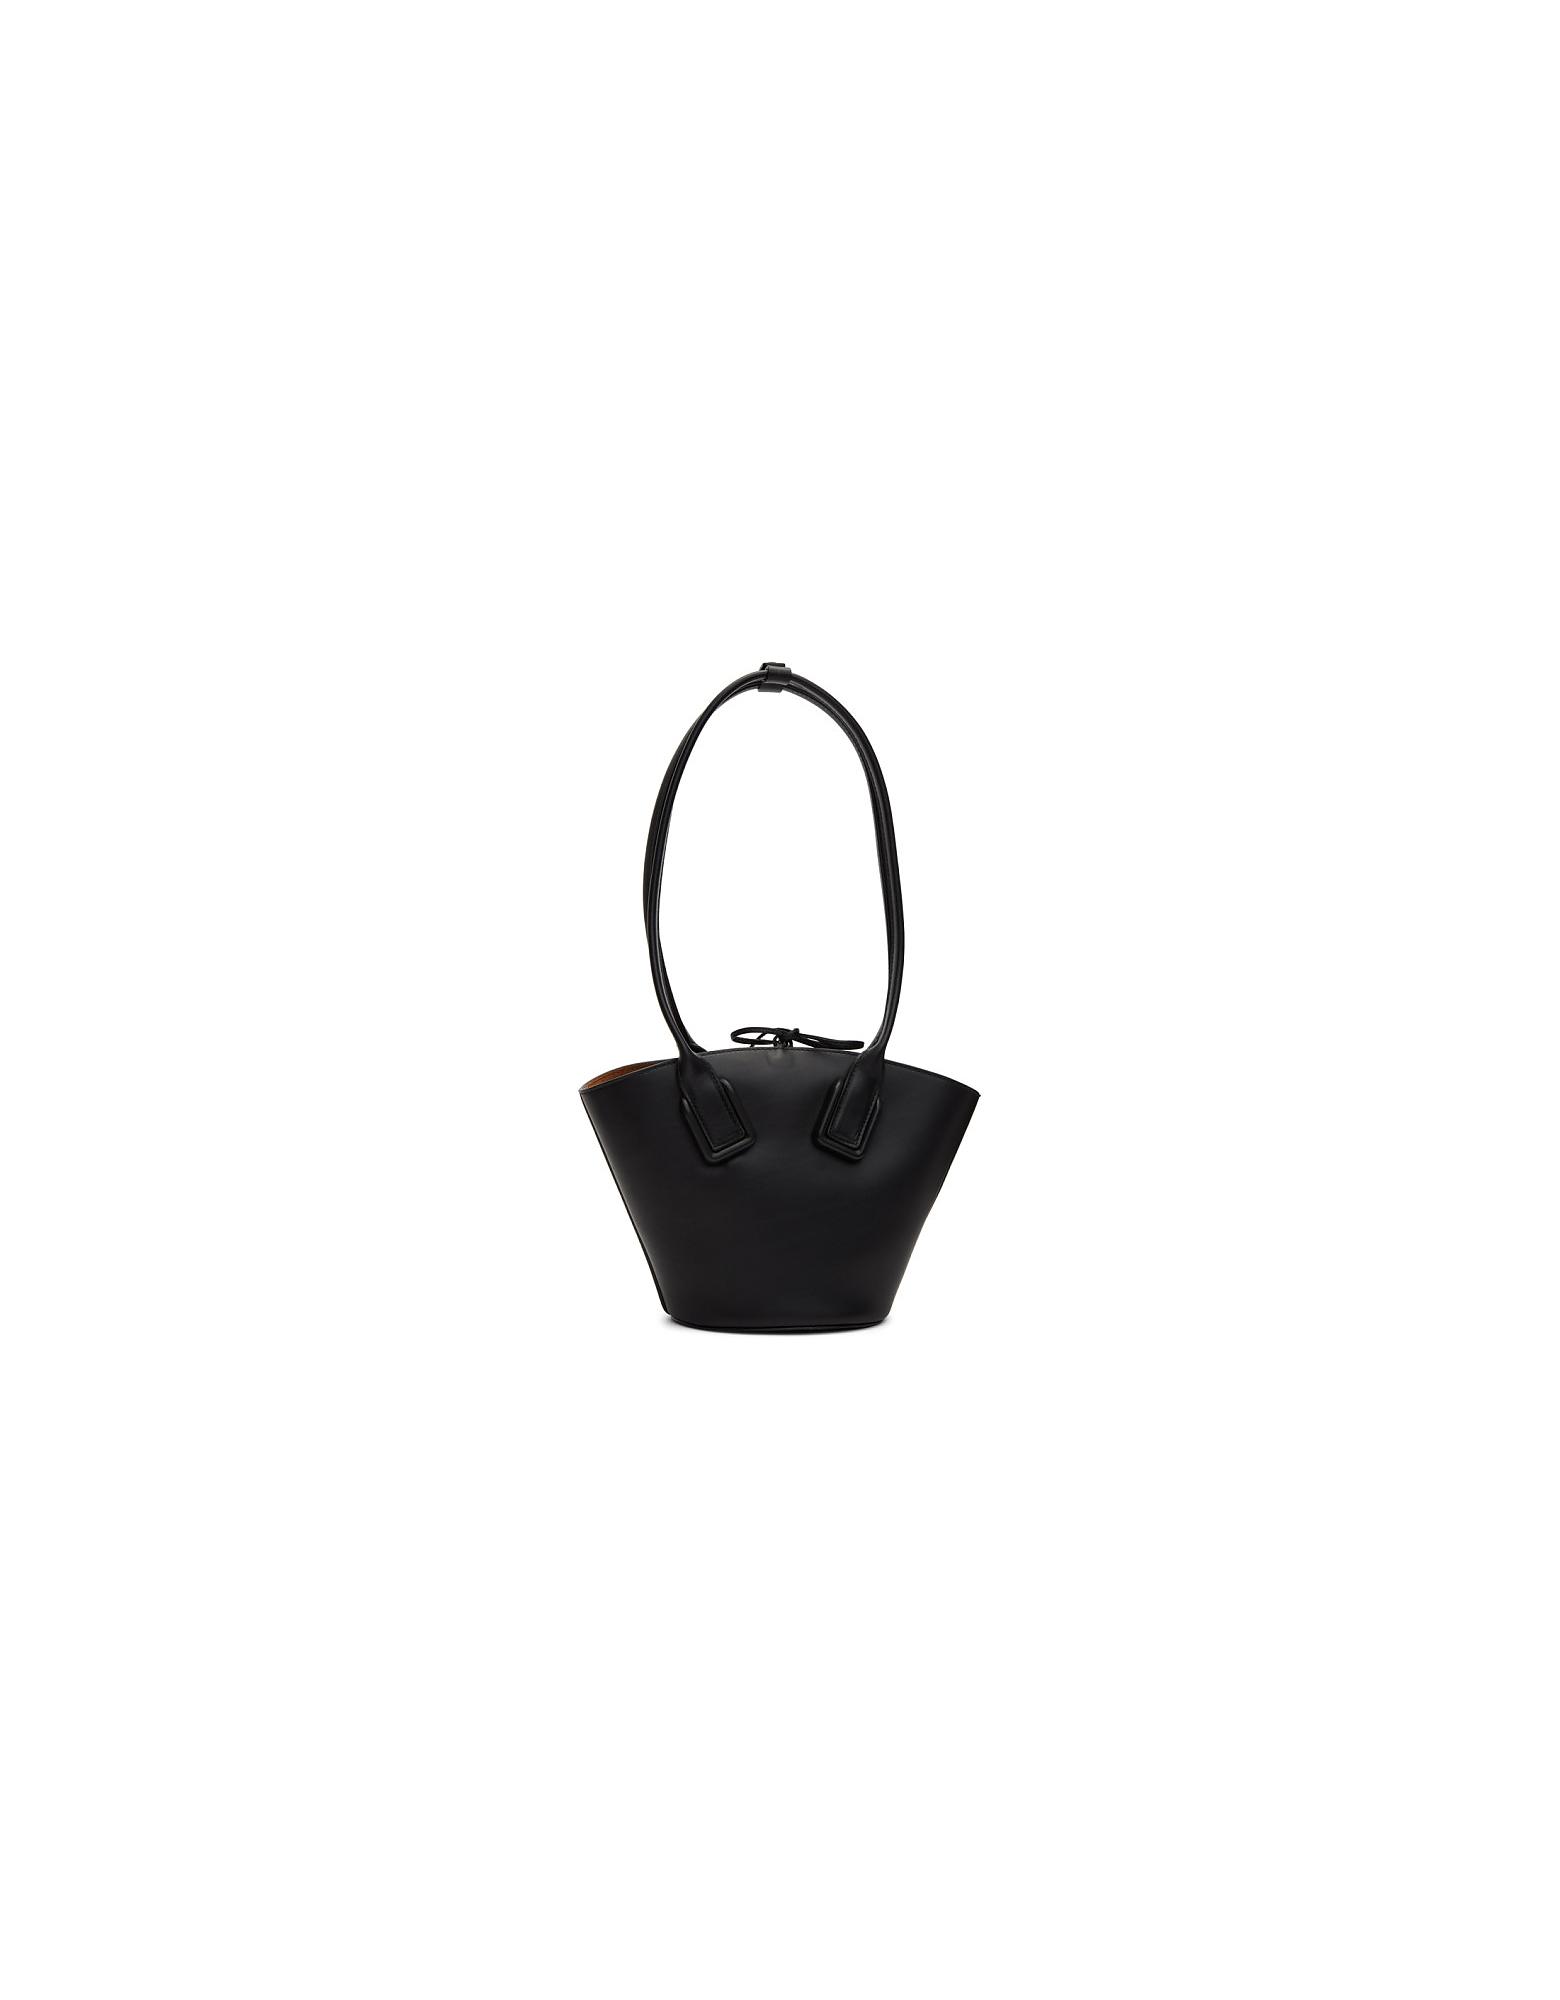 Bottega Veneta Designer Handbags, Black Mini Basket Tote